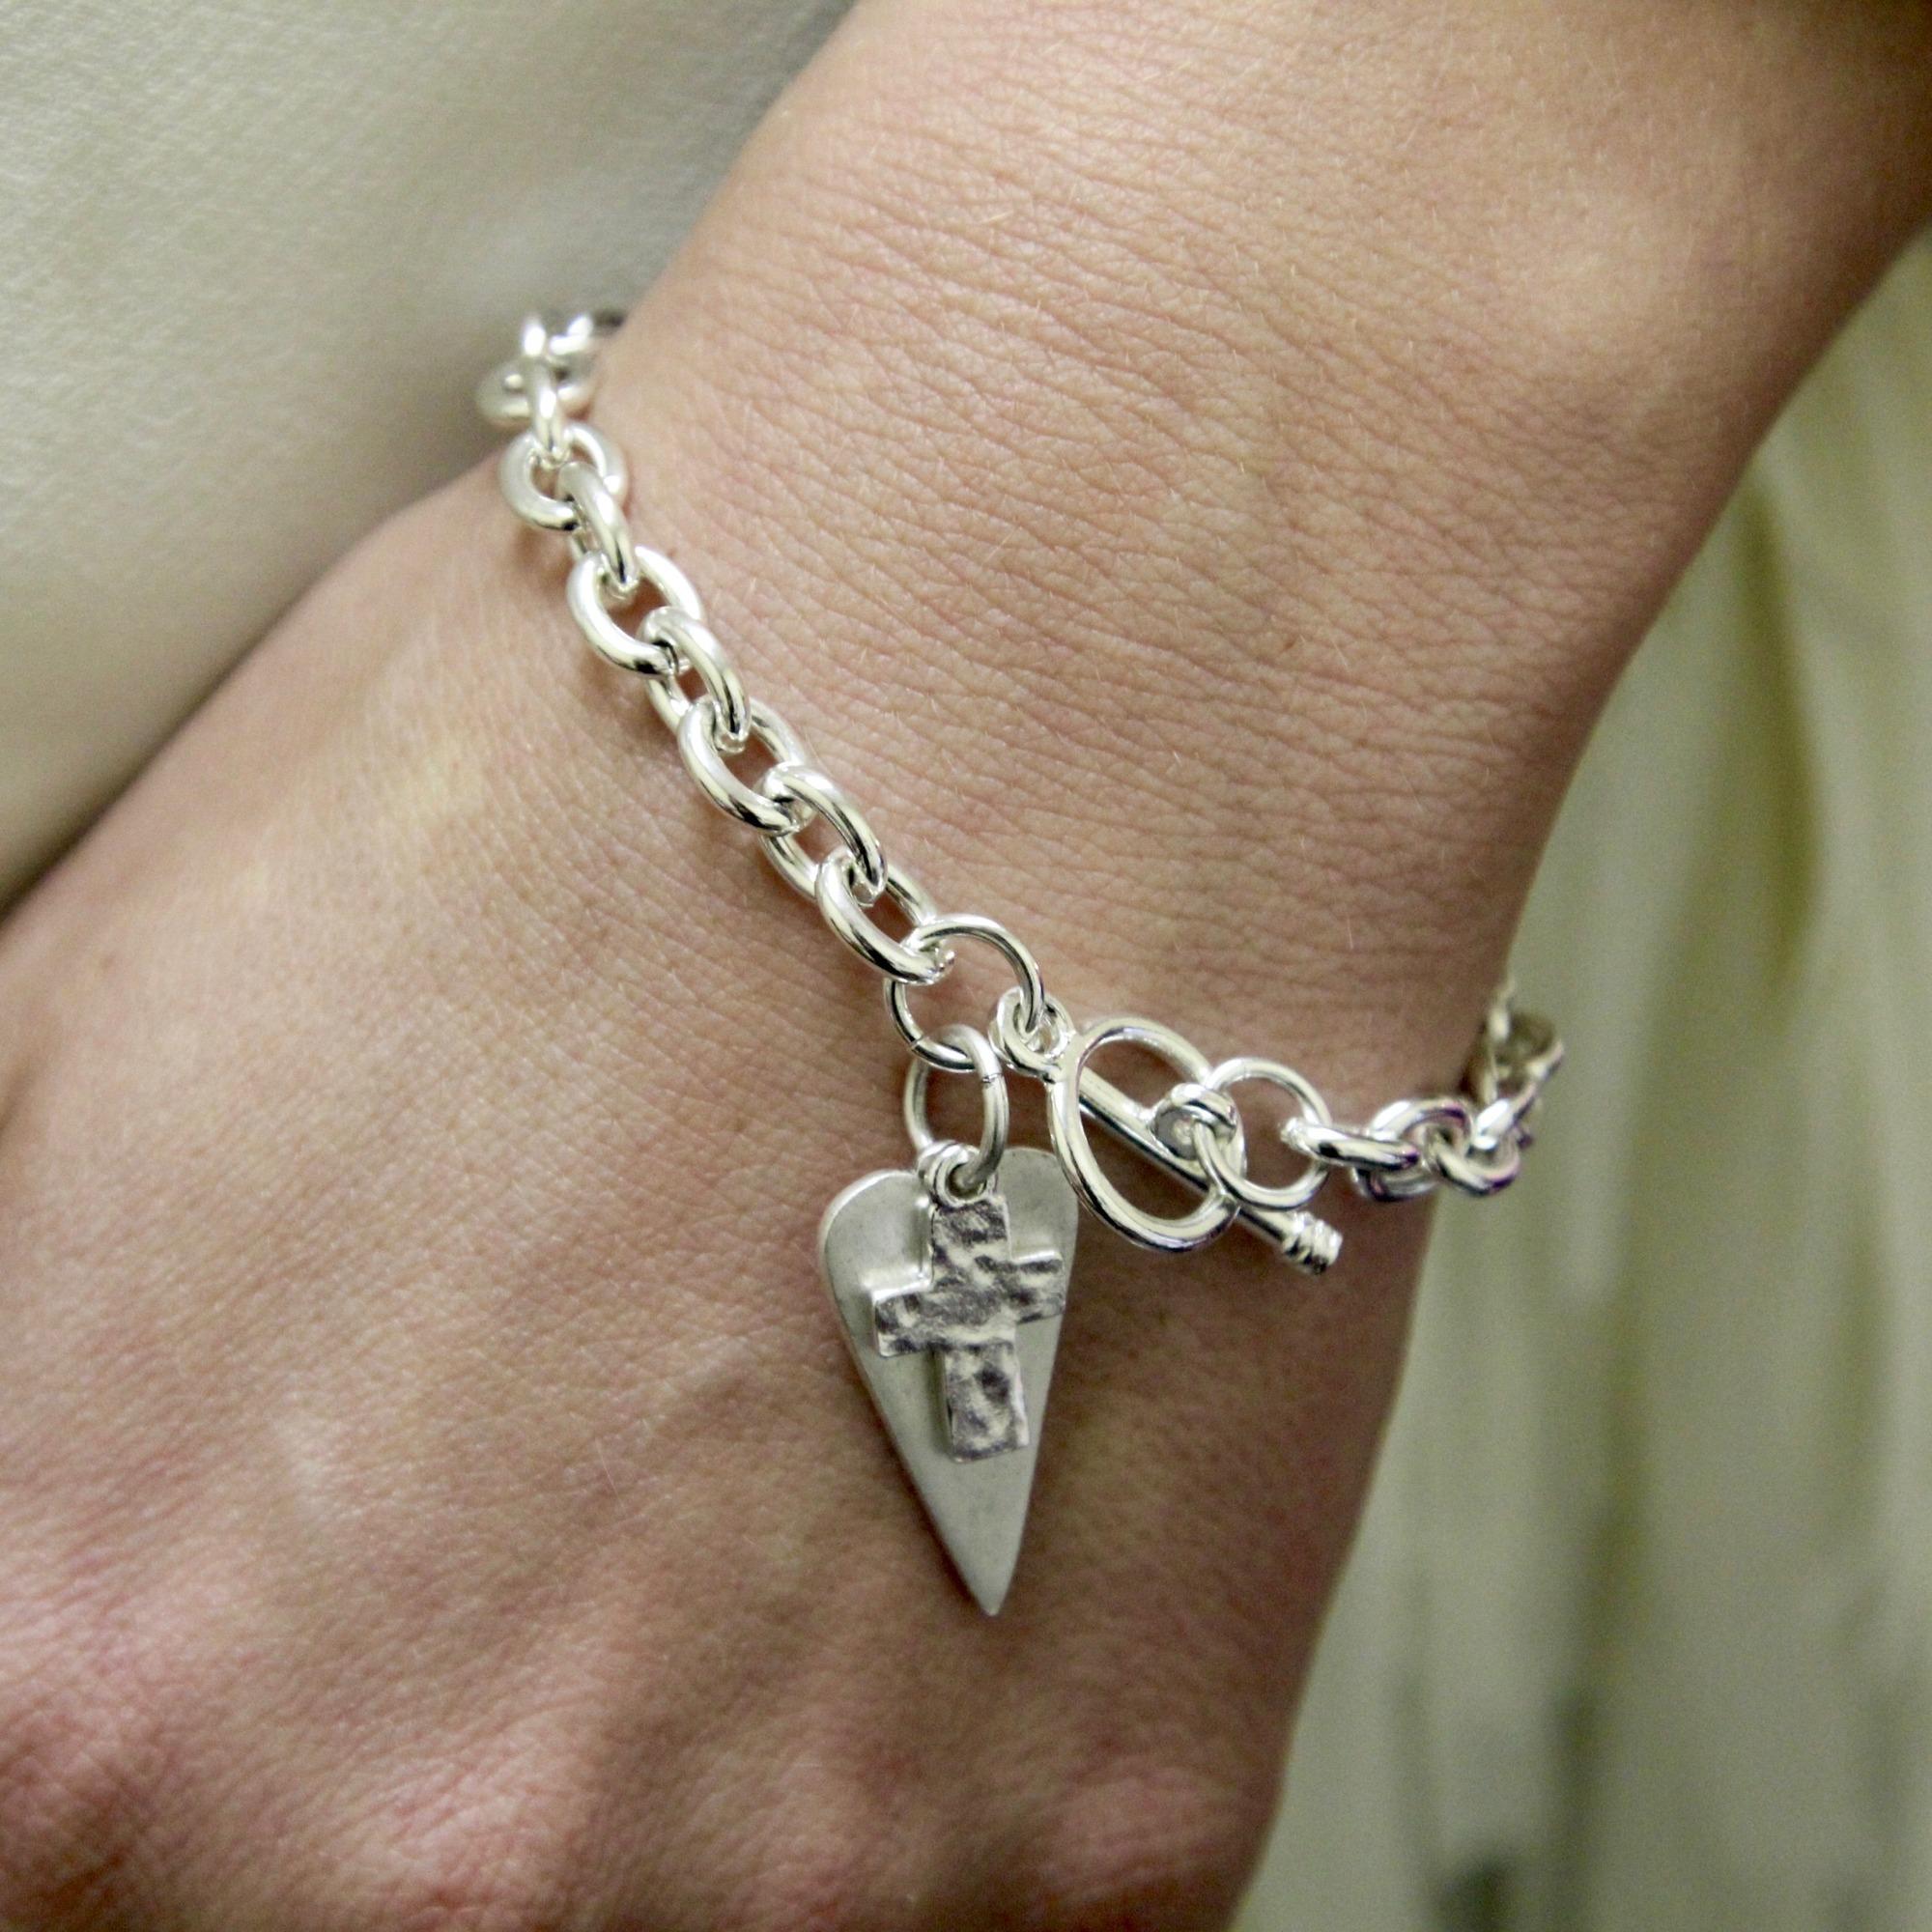 98e7dbcb3 Personalized Tiffany Style Heart Cross Bracelet | The Catholic Company